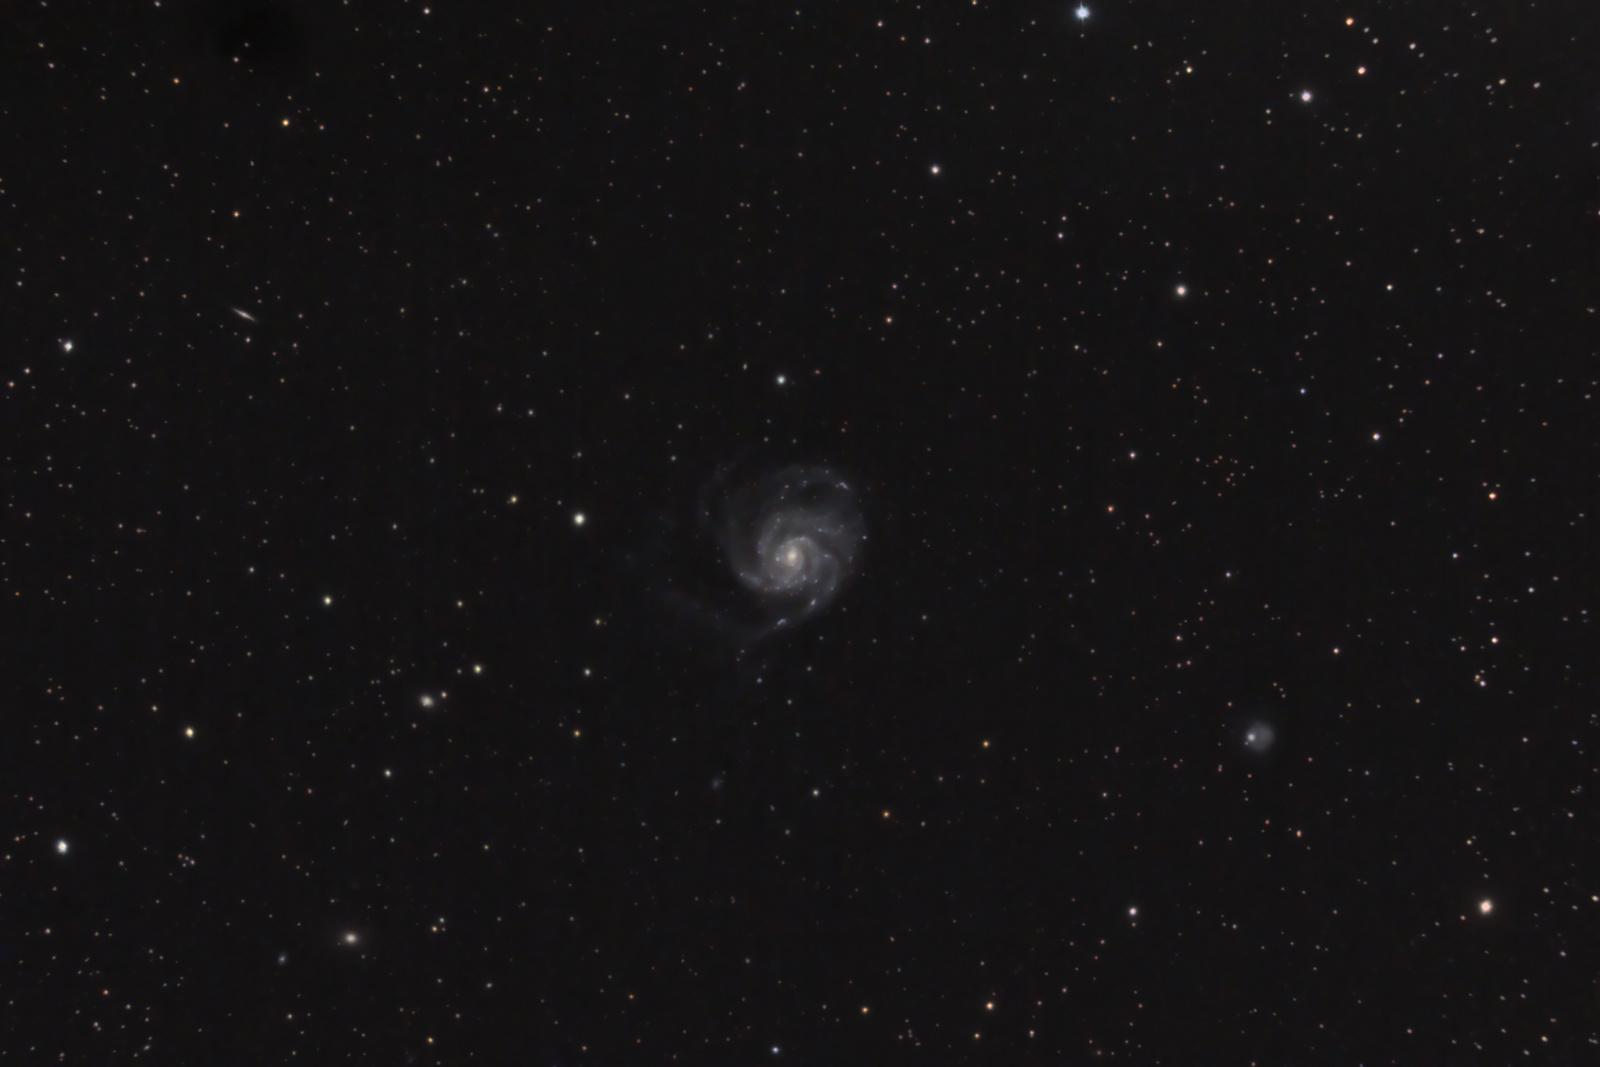 M101.thumb.jpg.224a686abce0caec8971b1050dd1fc57.jpg